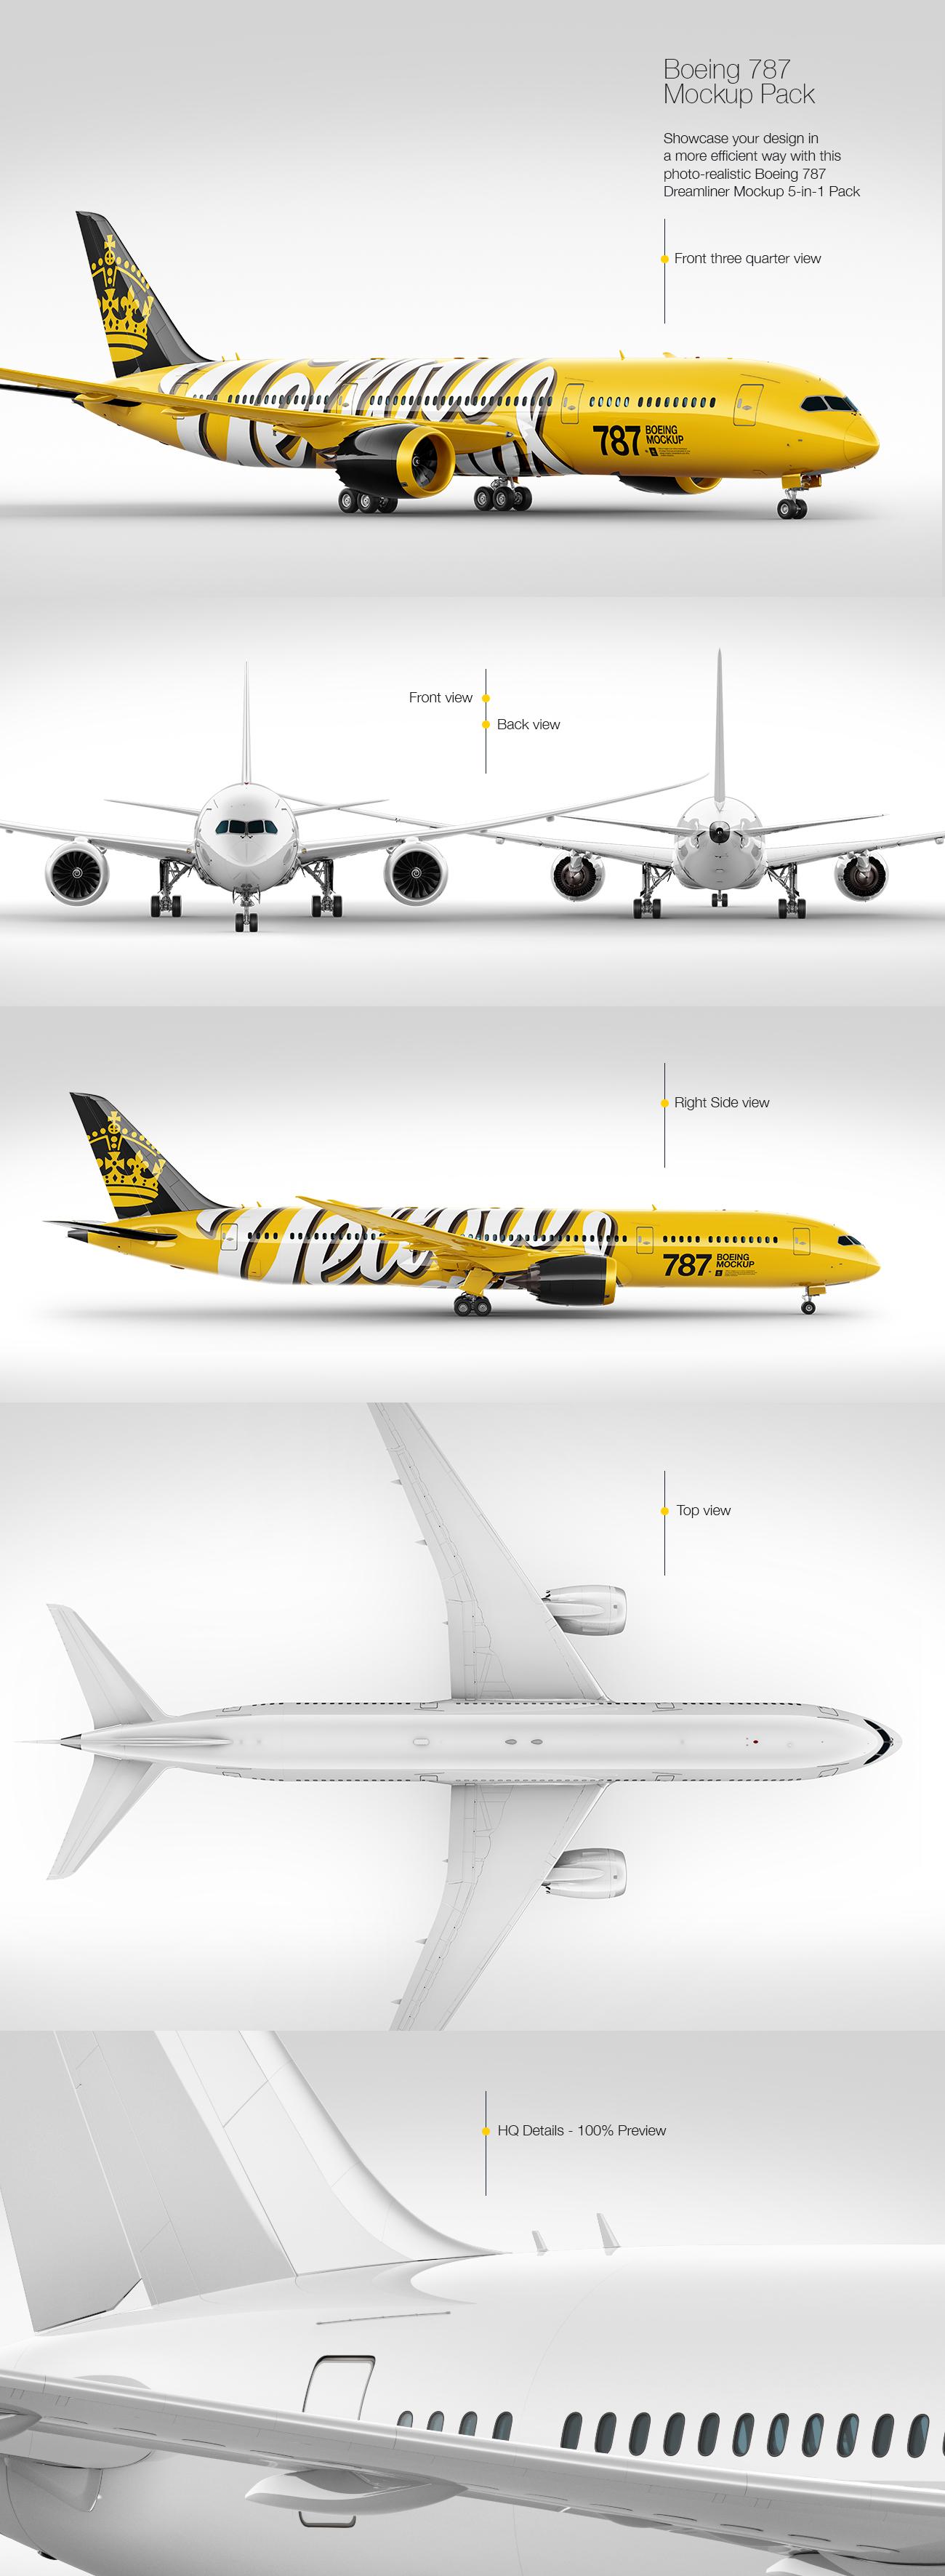 Boeing 787 Dreamliner Mockup Pack